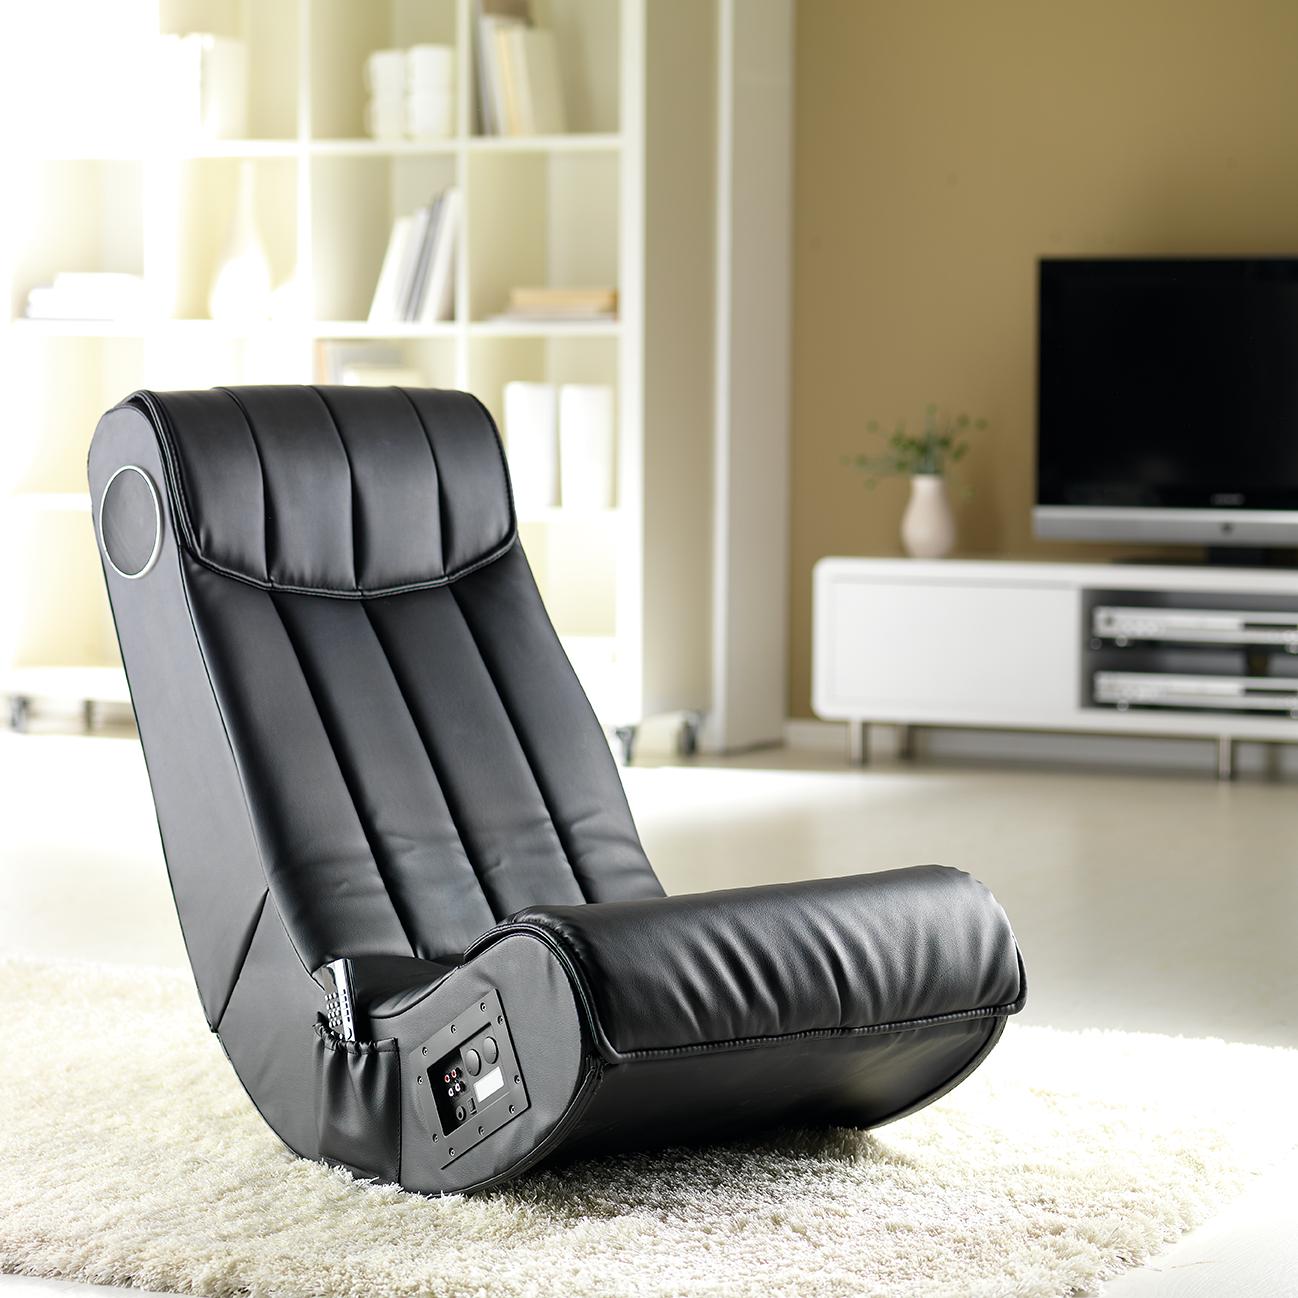 sessel mit lautsprecher momax m bel inspiration und. Black Bedroom Furniture Sets. Home Design Ideas